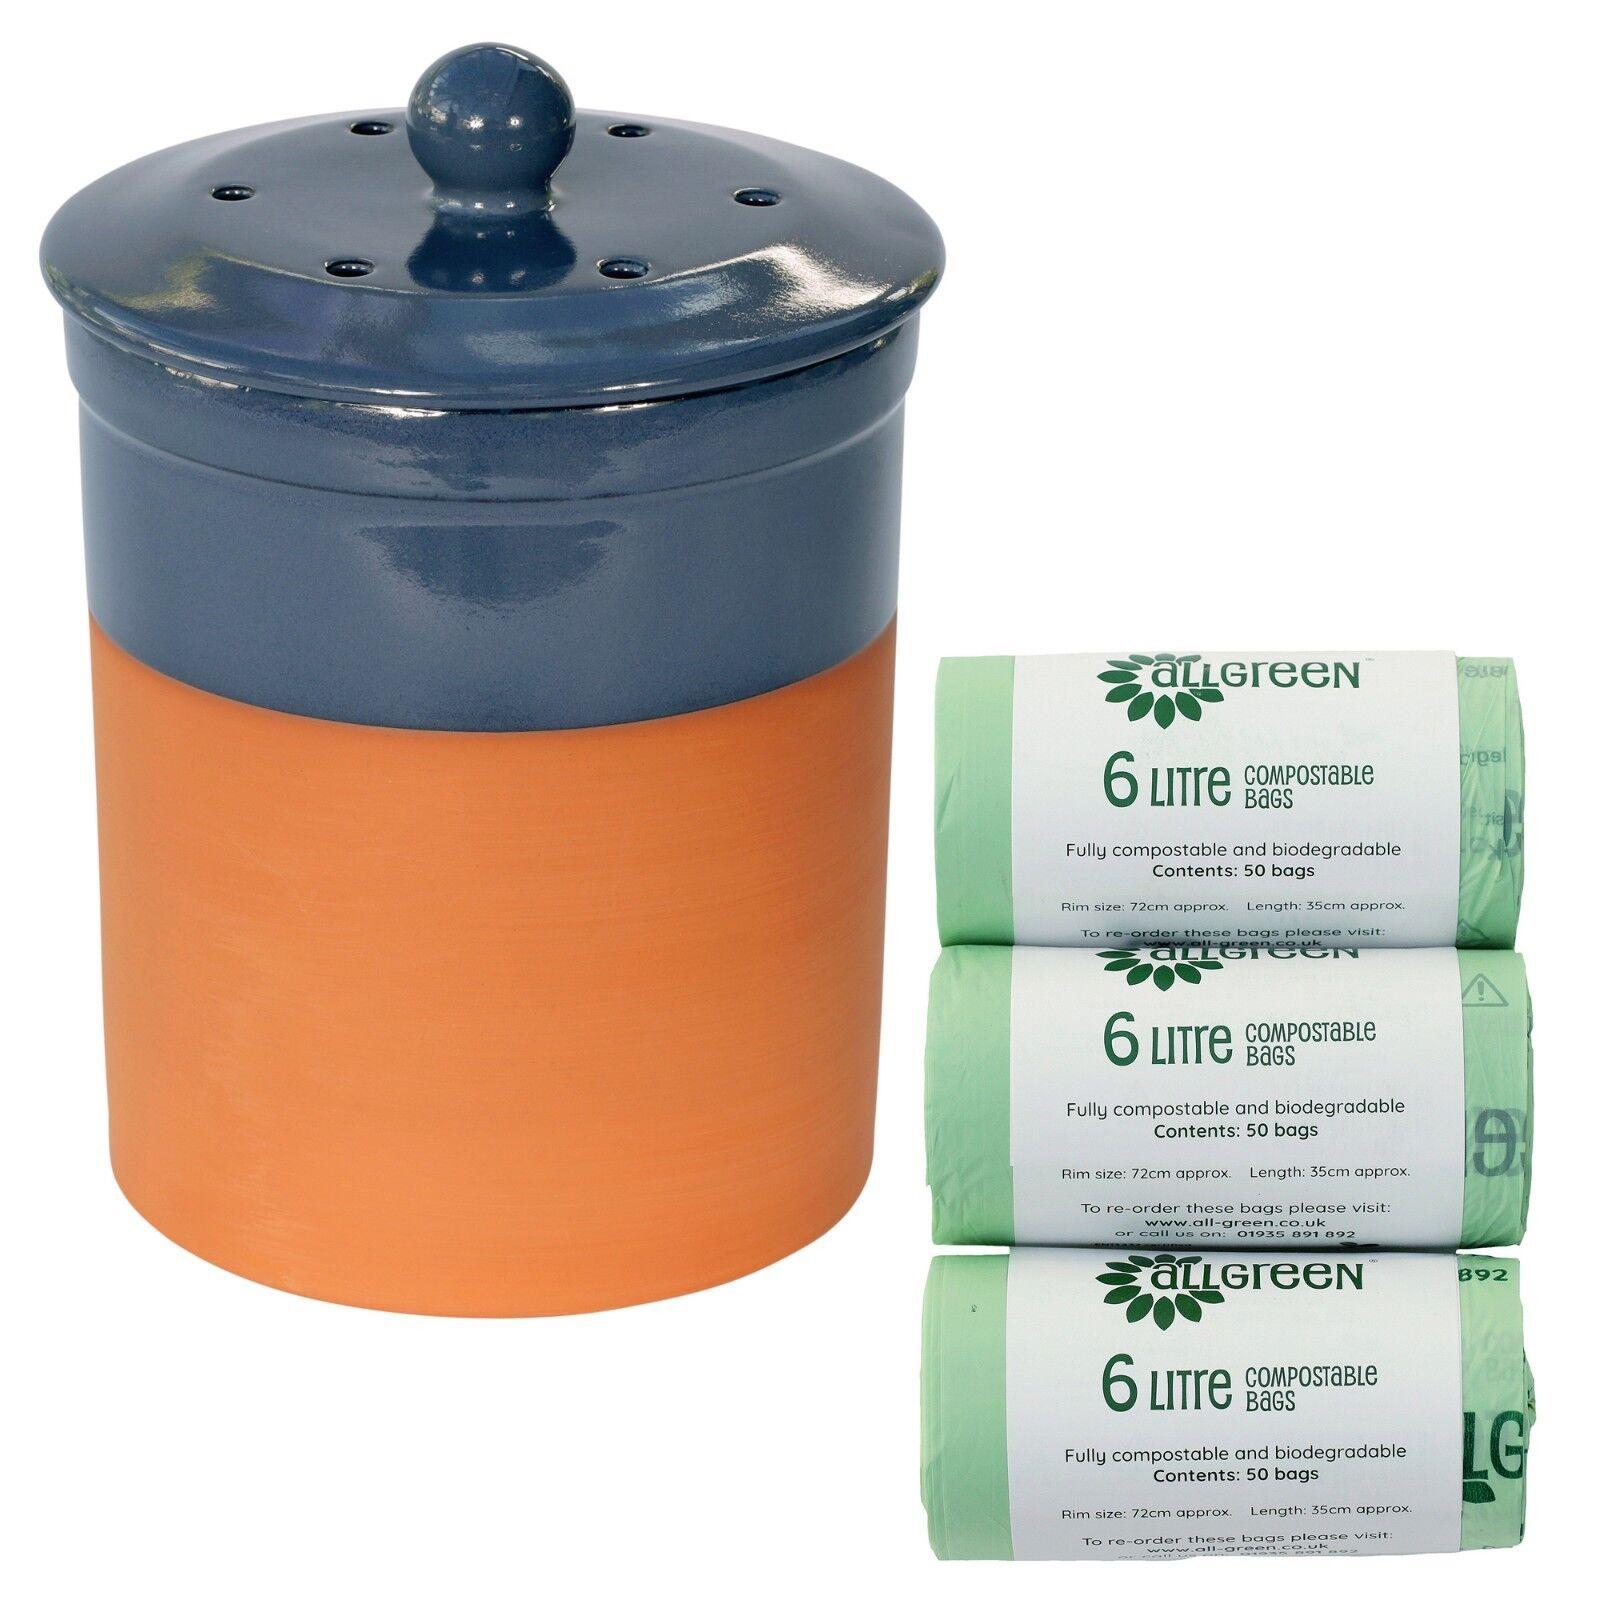 Chetnole Terracotta Compost Caddy - Blau & 150x Biobags - Ceramic Kitchen Bin